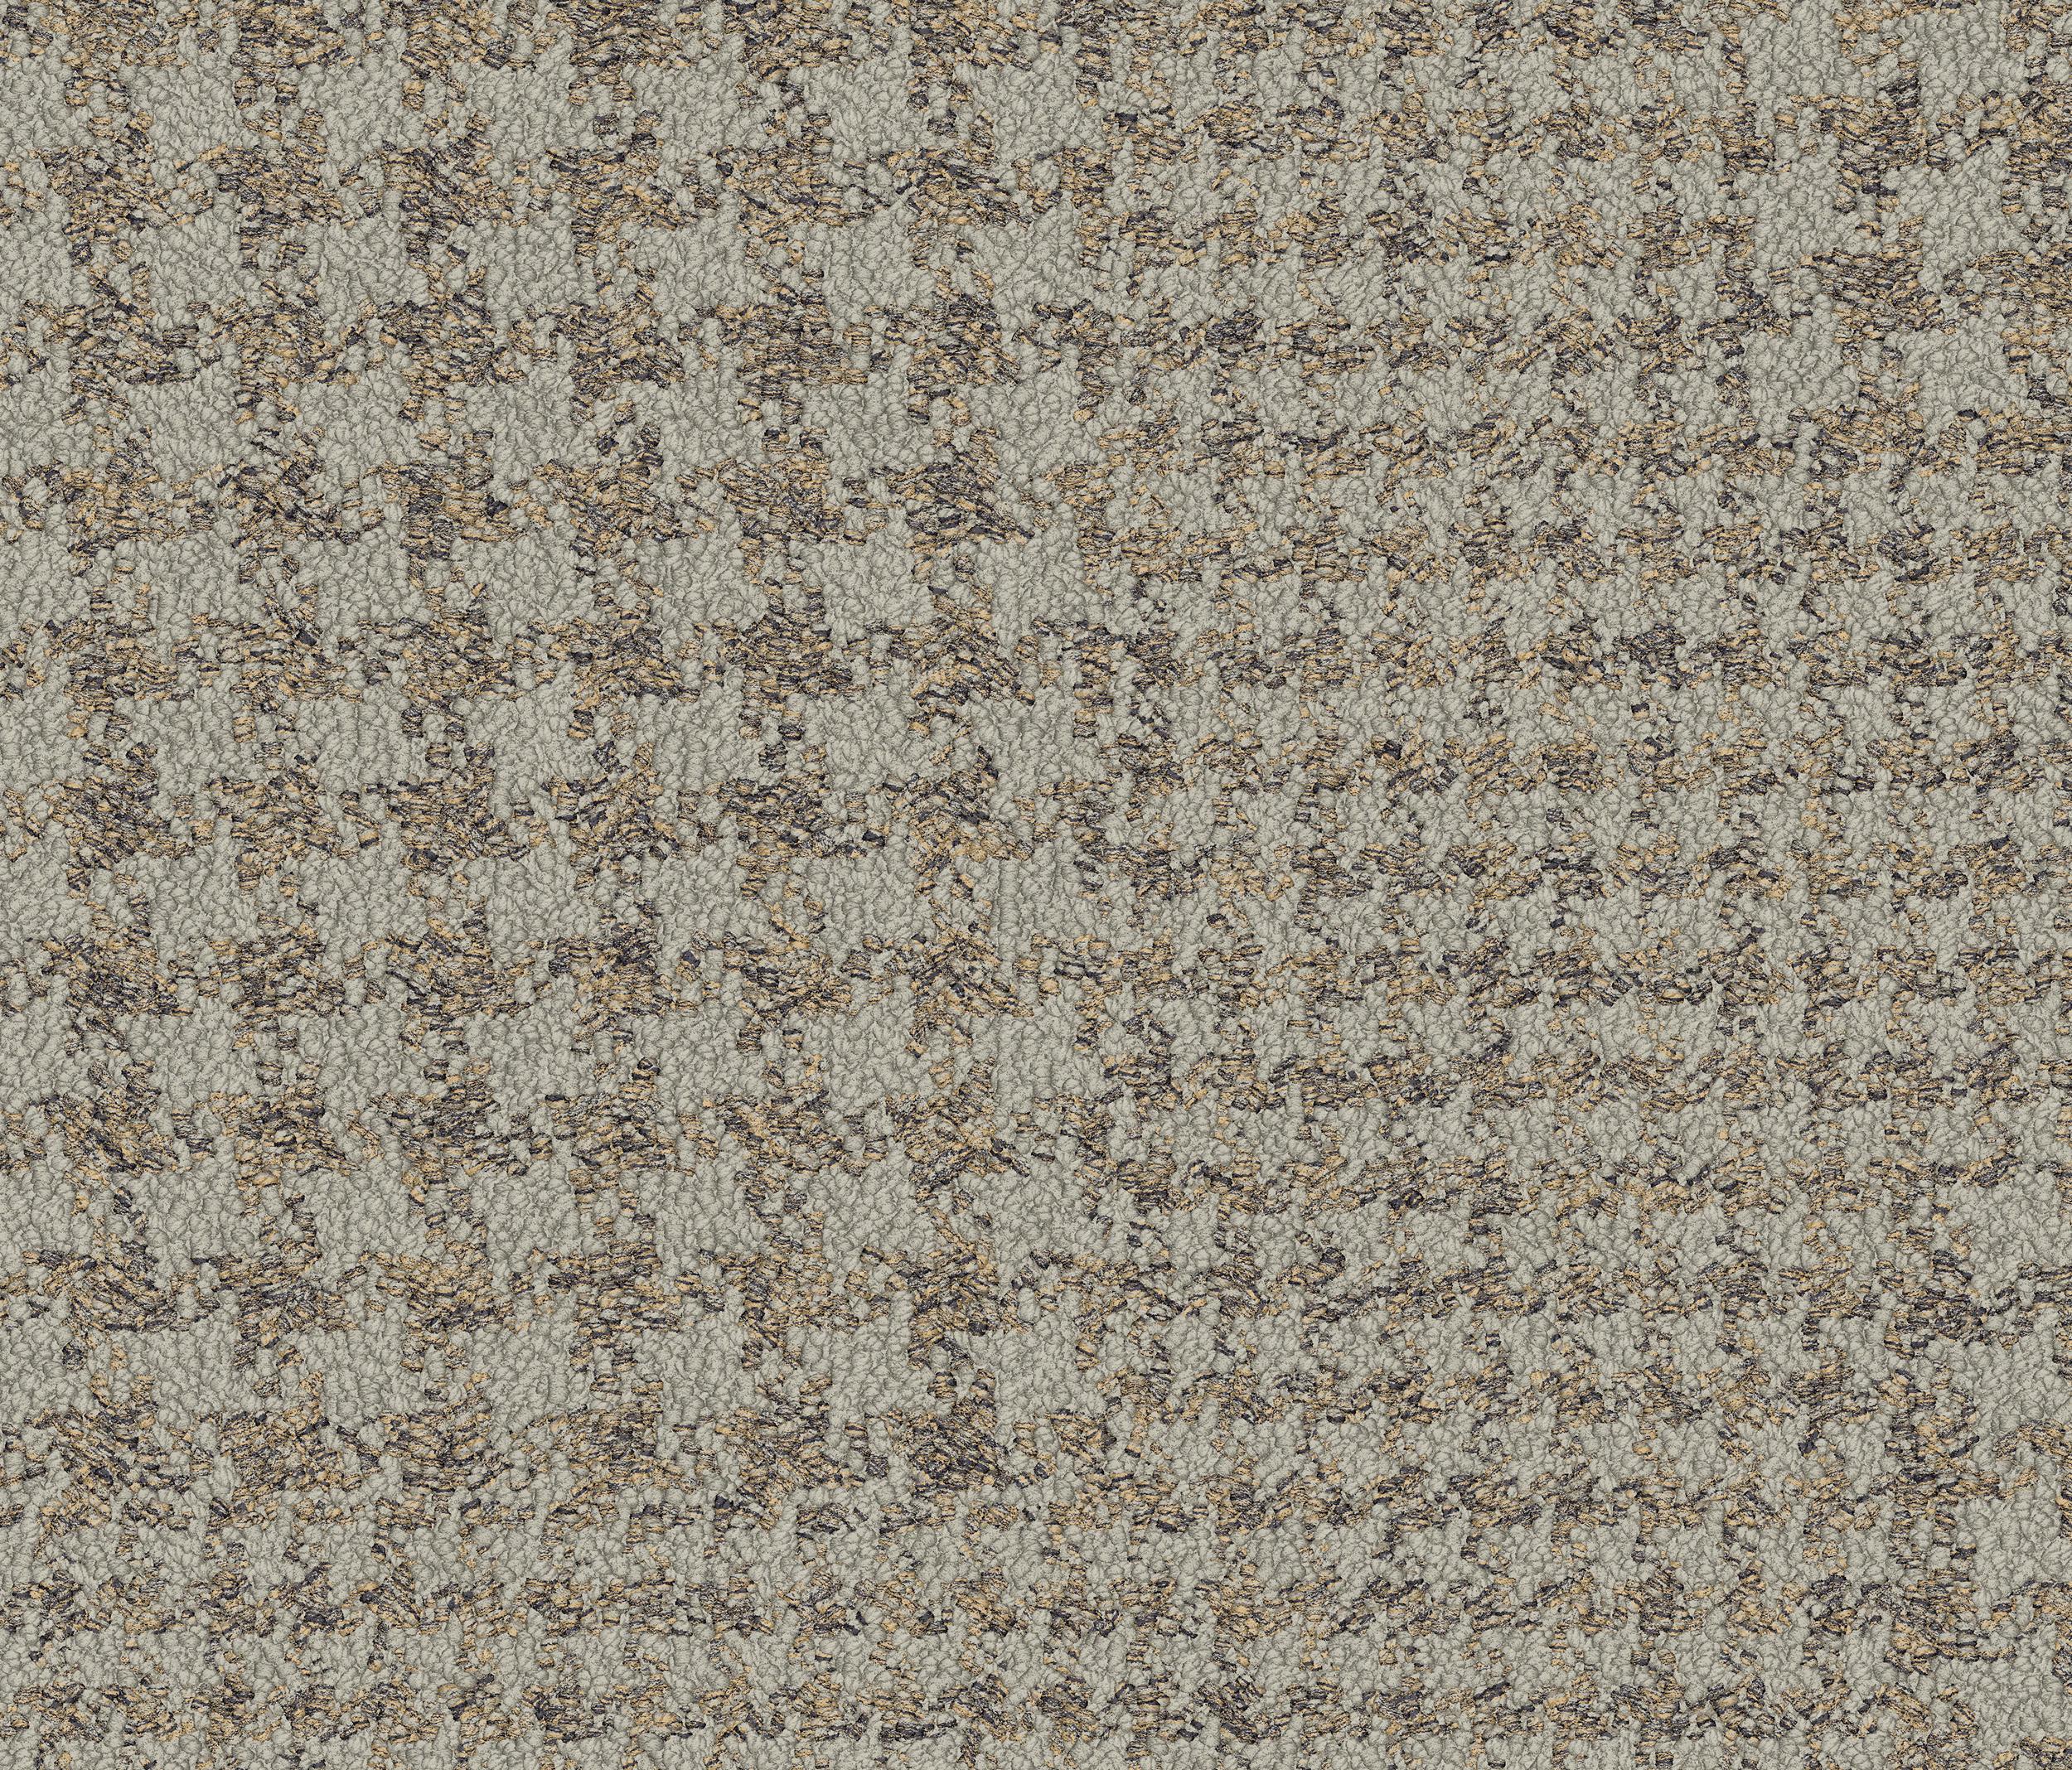 World Woven Collins Cottage Hound Linen Carpet Tiles